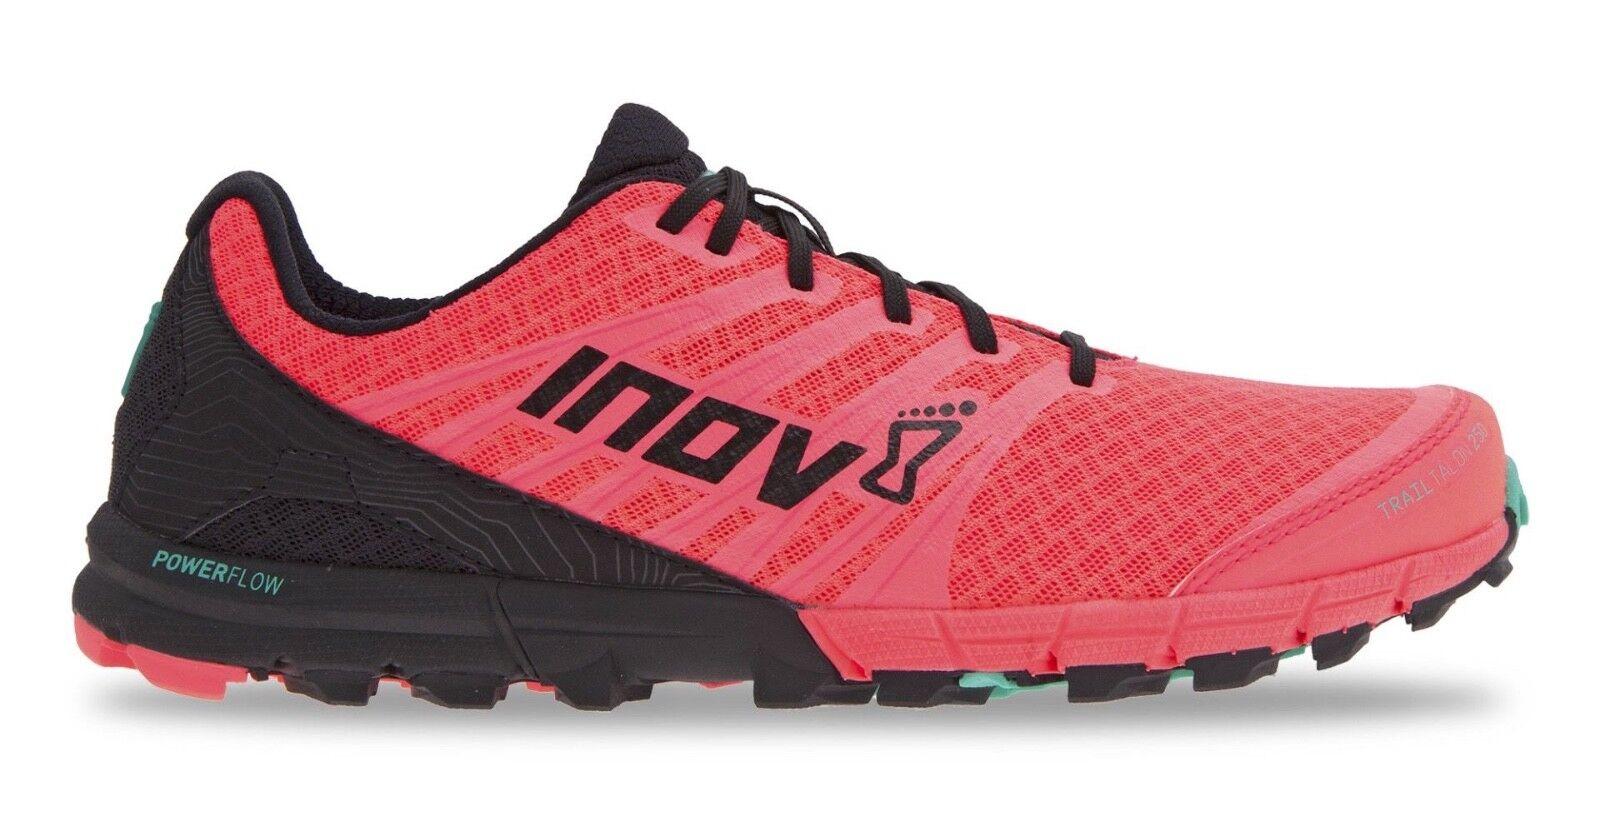 Inov8 TRAILTALON 250 femmes Running Chaussures rose/ noir